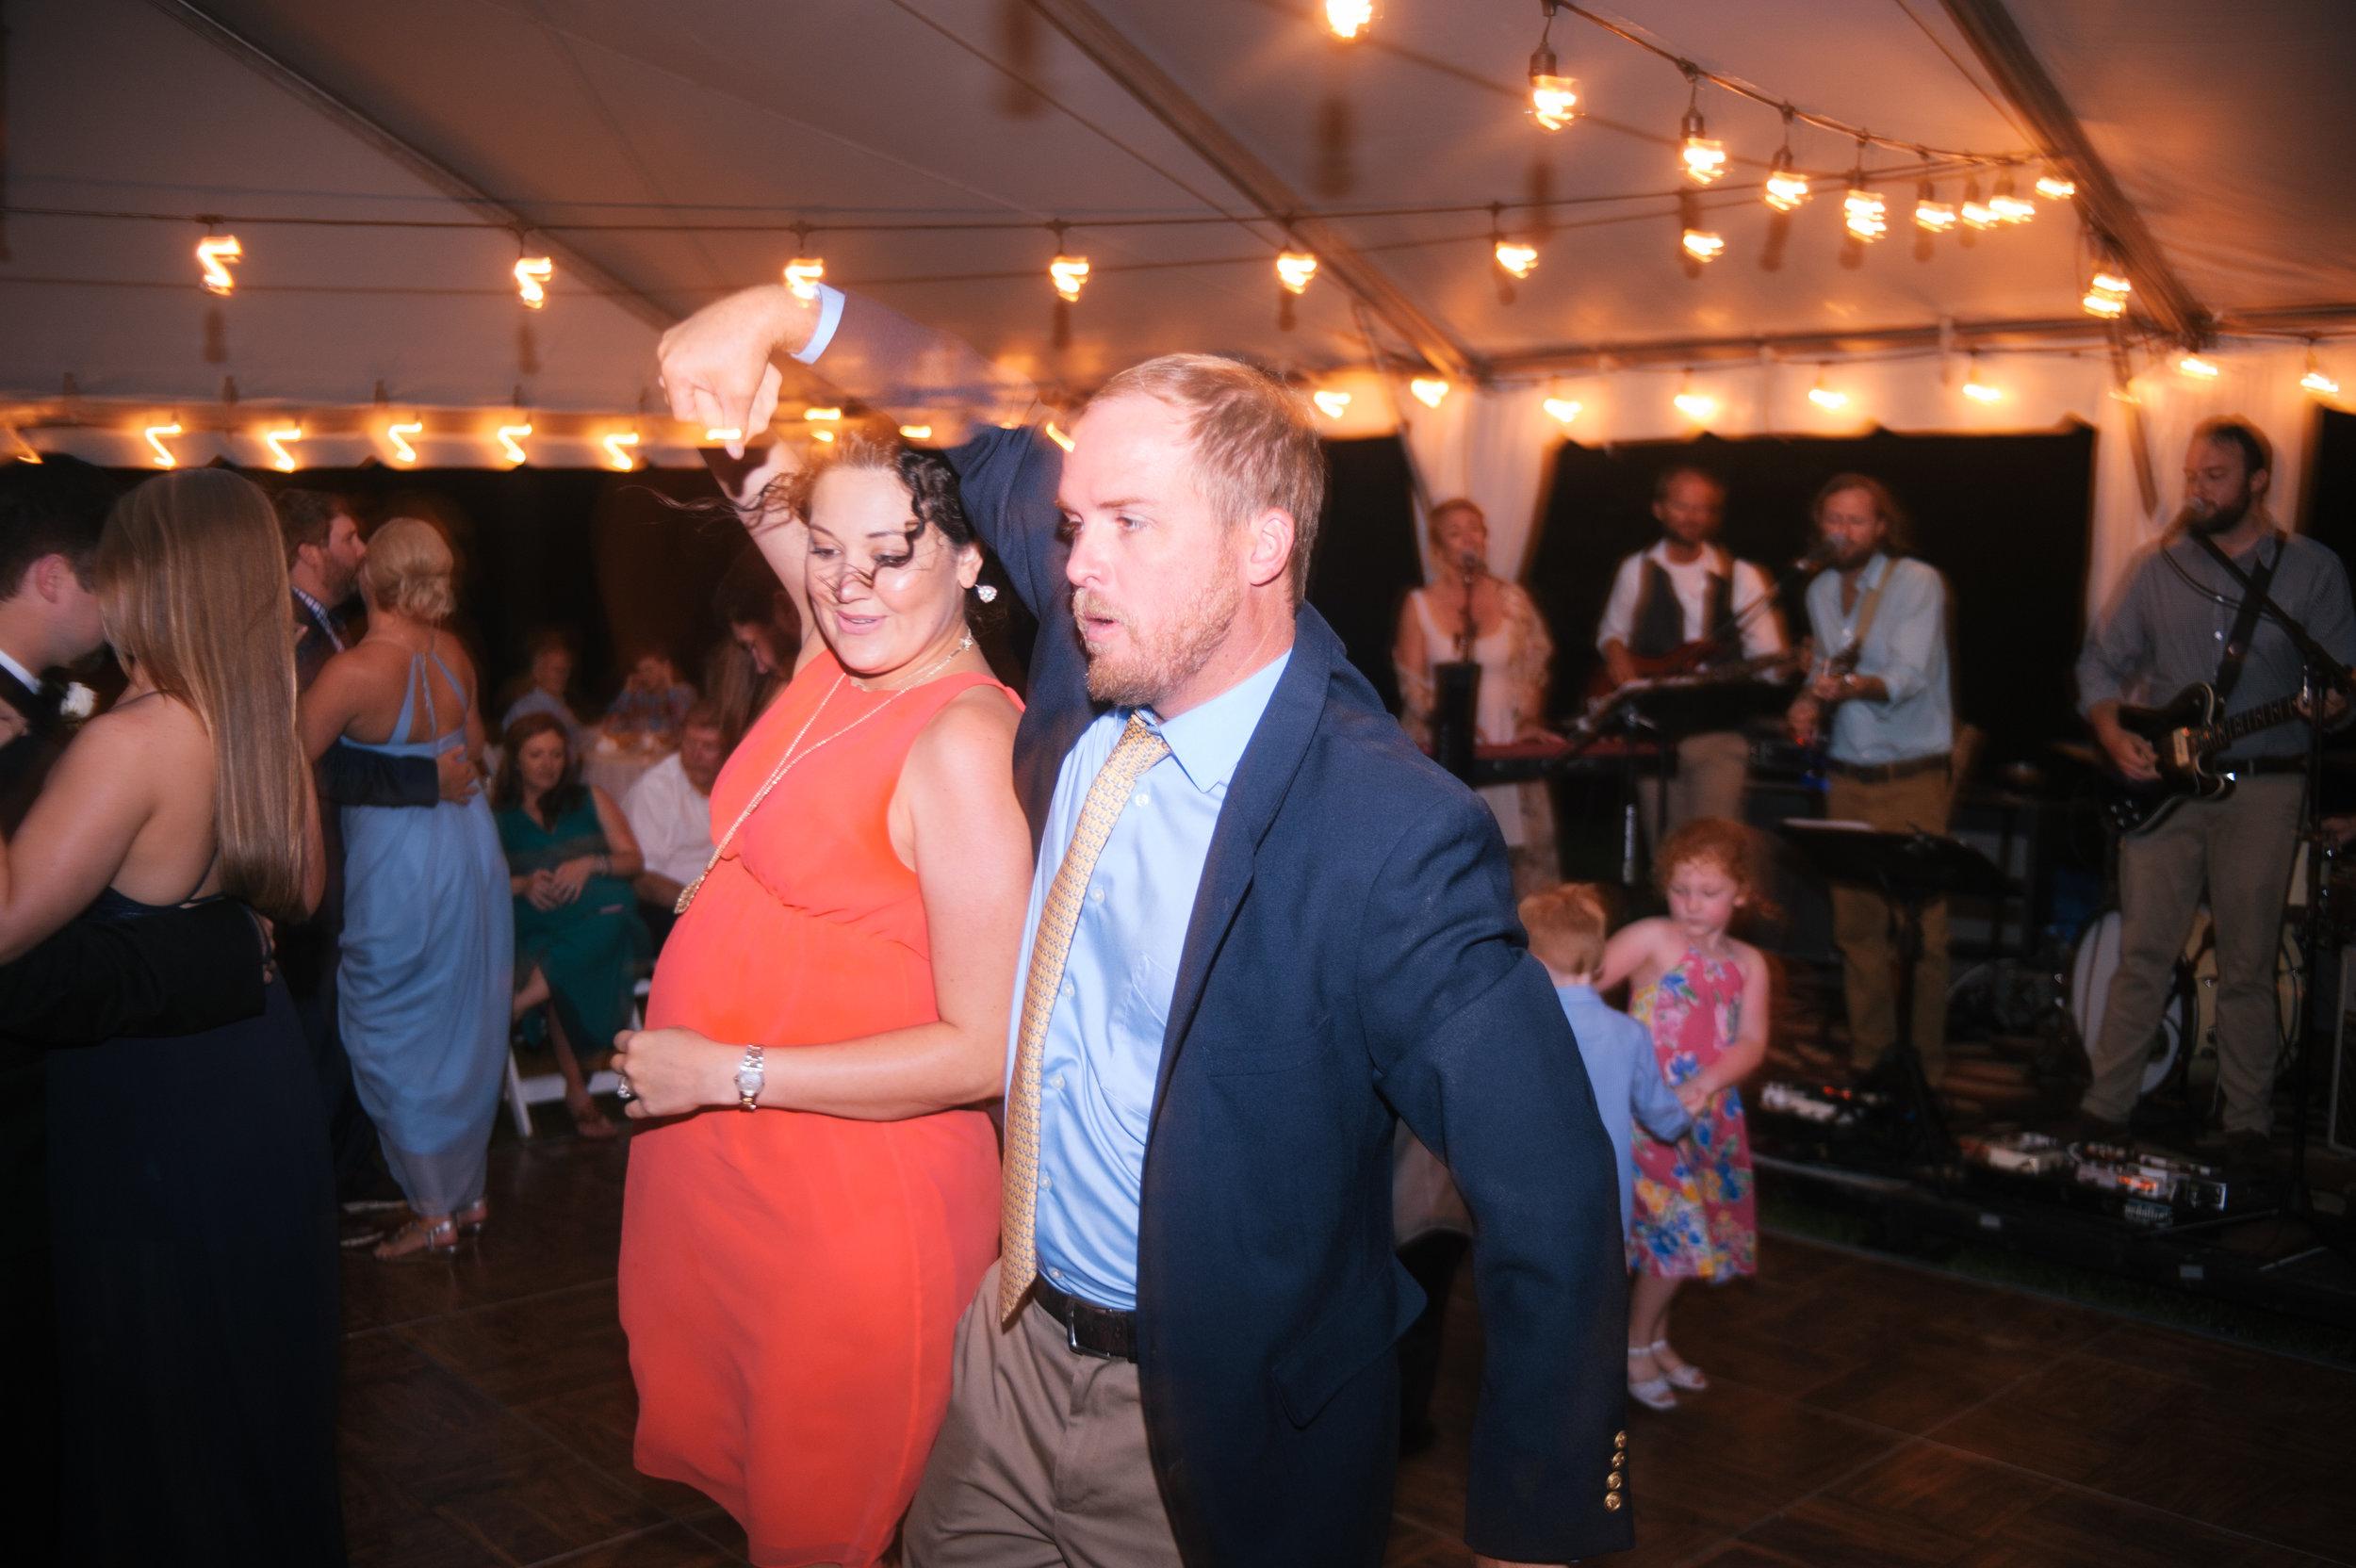 ali-and-jared-savannah-georgia-may-2017-wedding-meg-hill-photo-(967of498).jpg